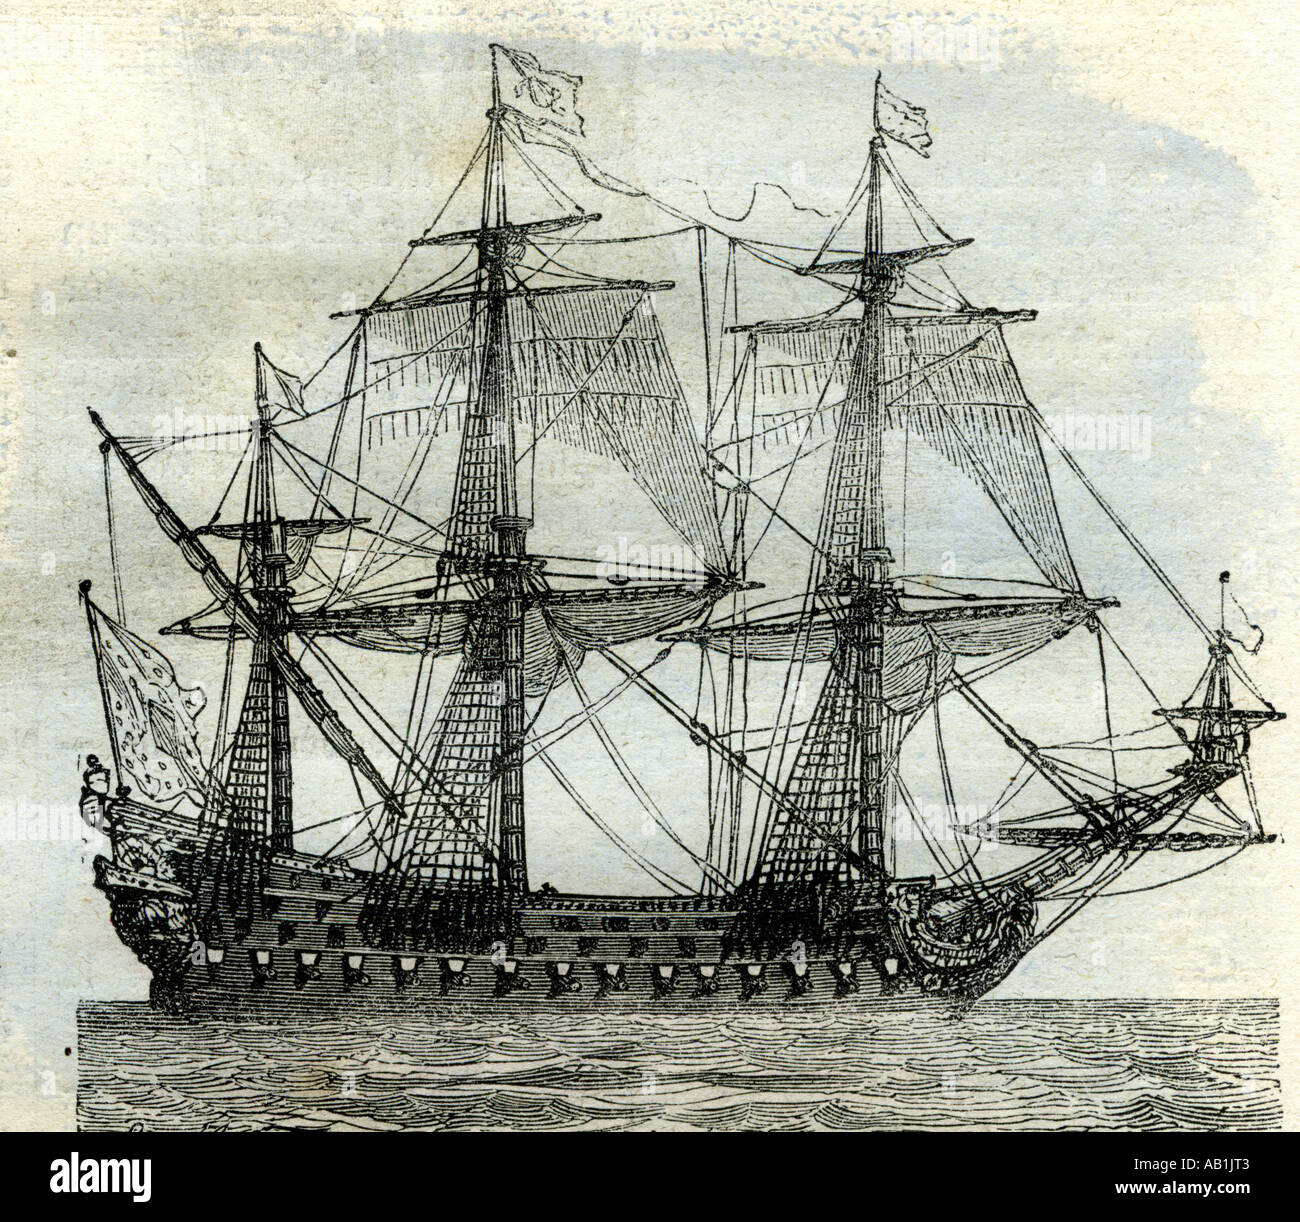 Ship Le Soleil Royal United Kingdom Stock Photo